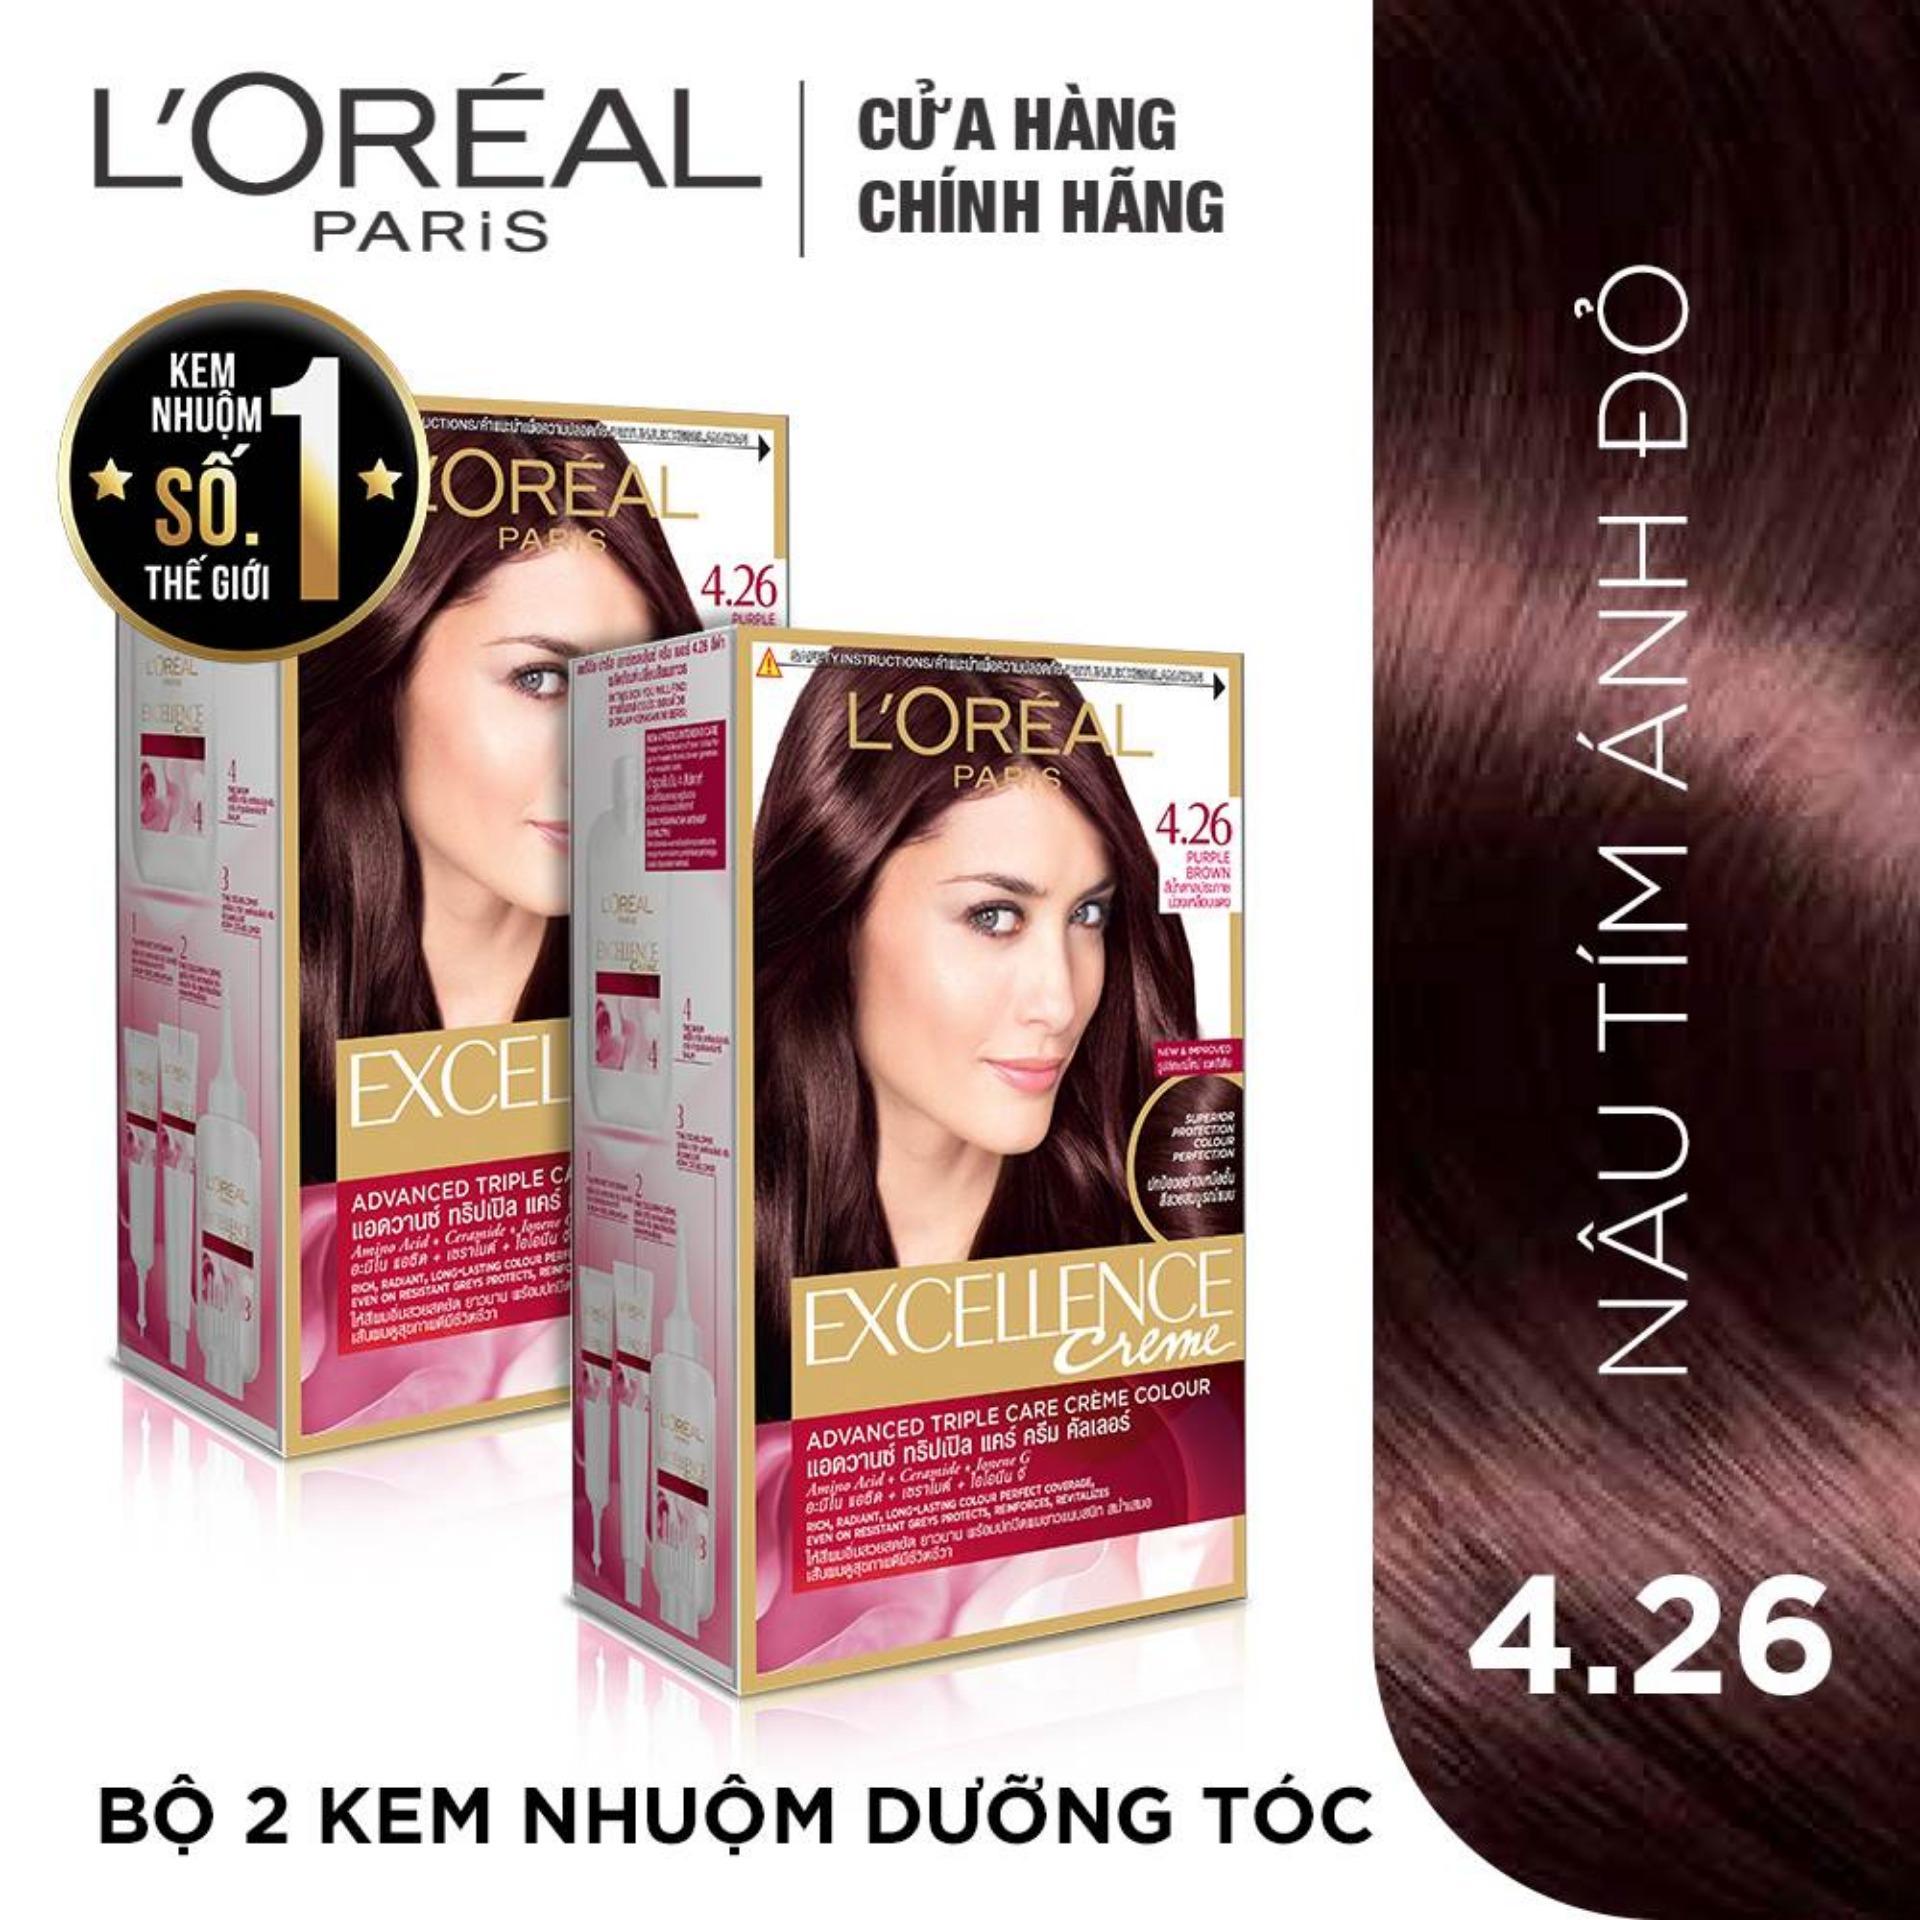 Bộ 2 kem nhuộm dưỡng tóc LOreal Paris Excellence Fashion 172mlx2